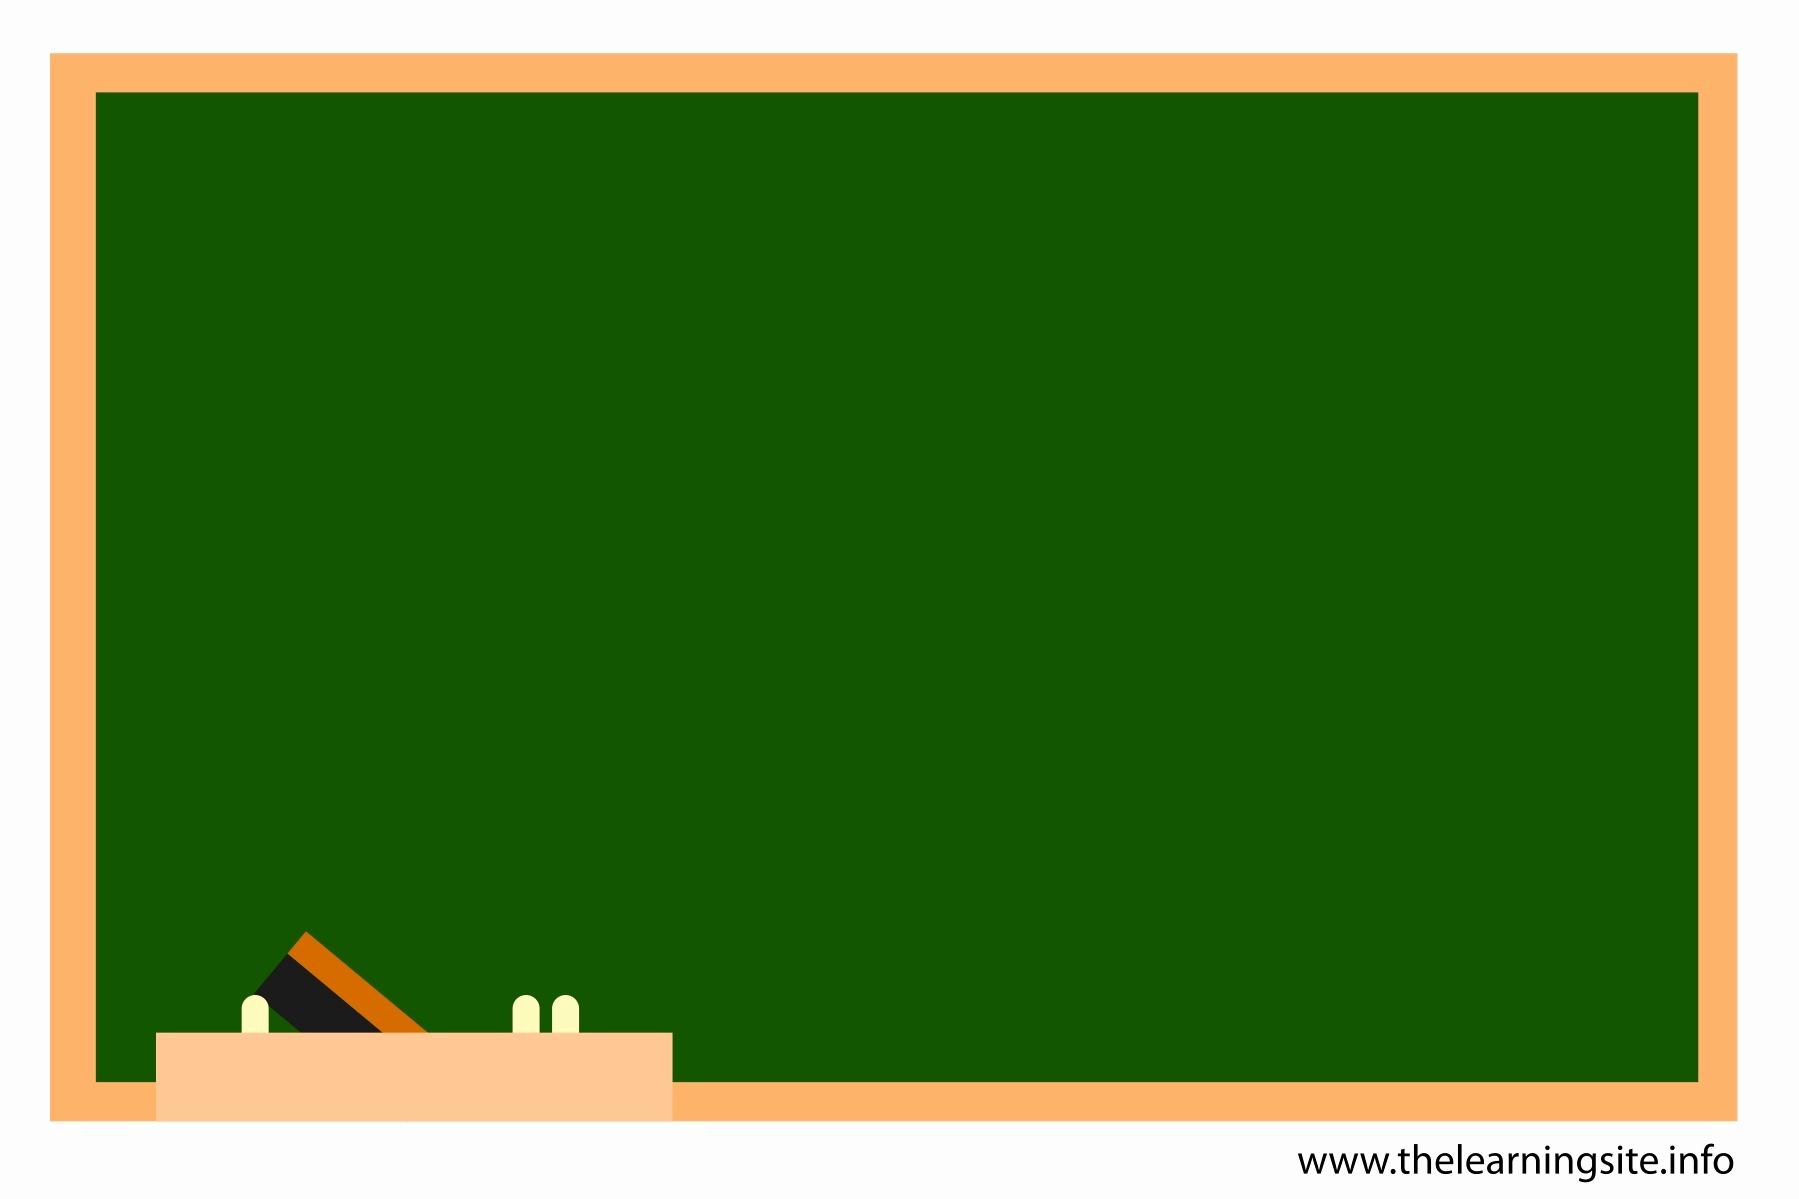 Blackboard clipart, Blackboard Transparent FREE for download.